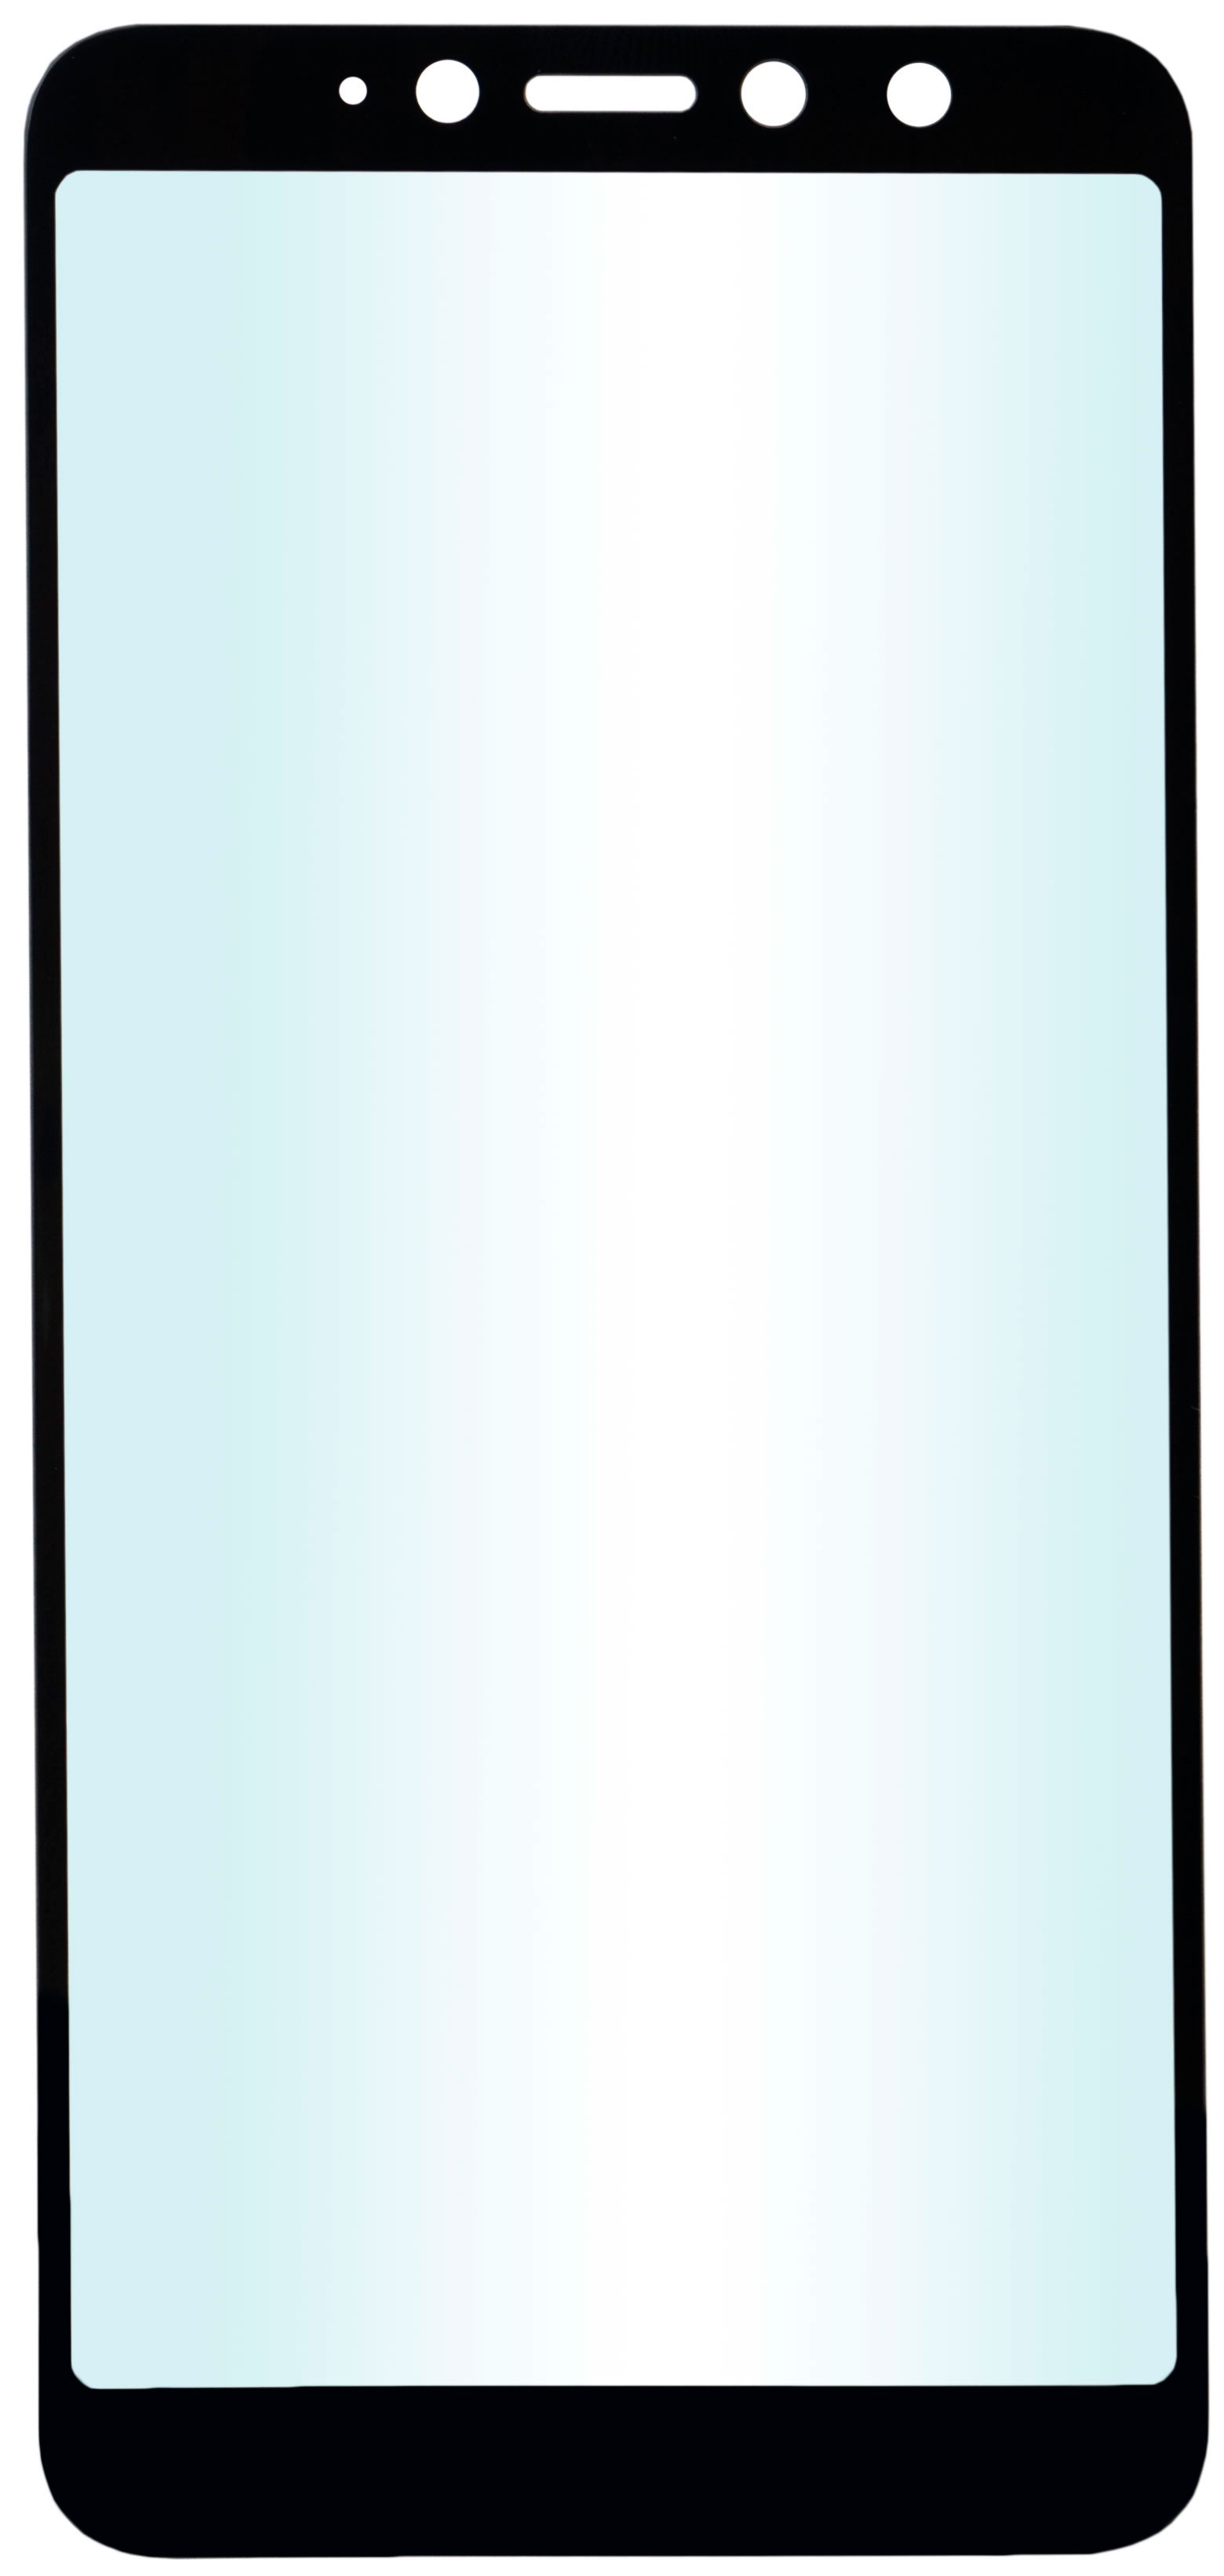 Защитное стекло skinBOX 1 side full screen, 4660041405460, черный защитное стекло skinbox full screen 4630042522817 черный